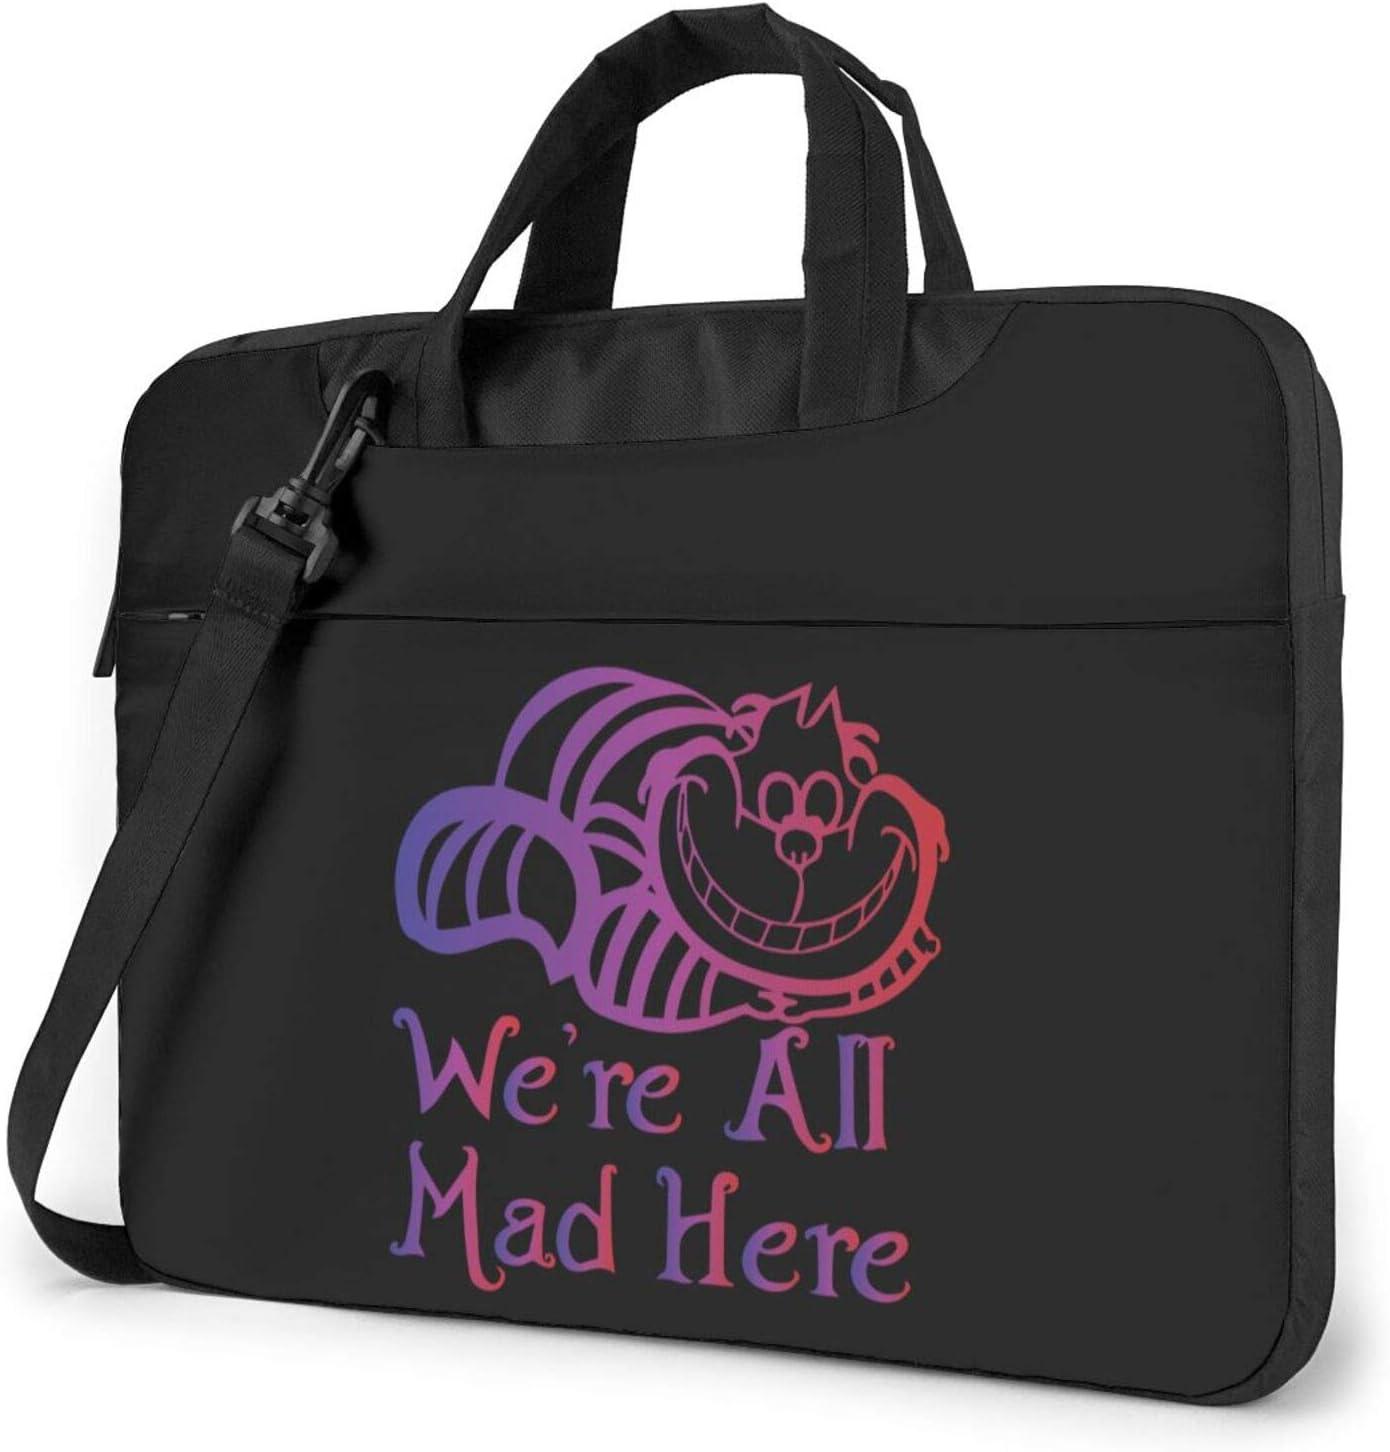 We're All Mad Here Laptop Bag 14 Shoulder Com Max 45% OFF Max 86% OFF Messenger Inch